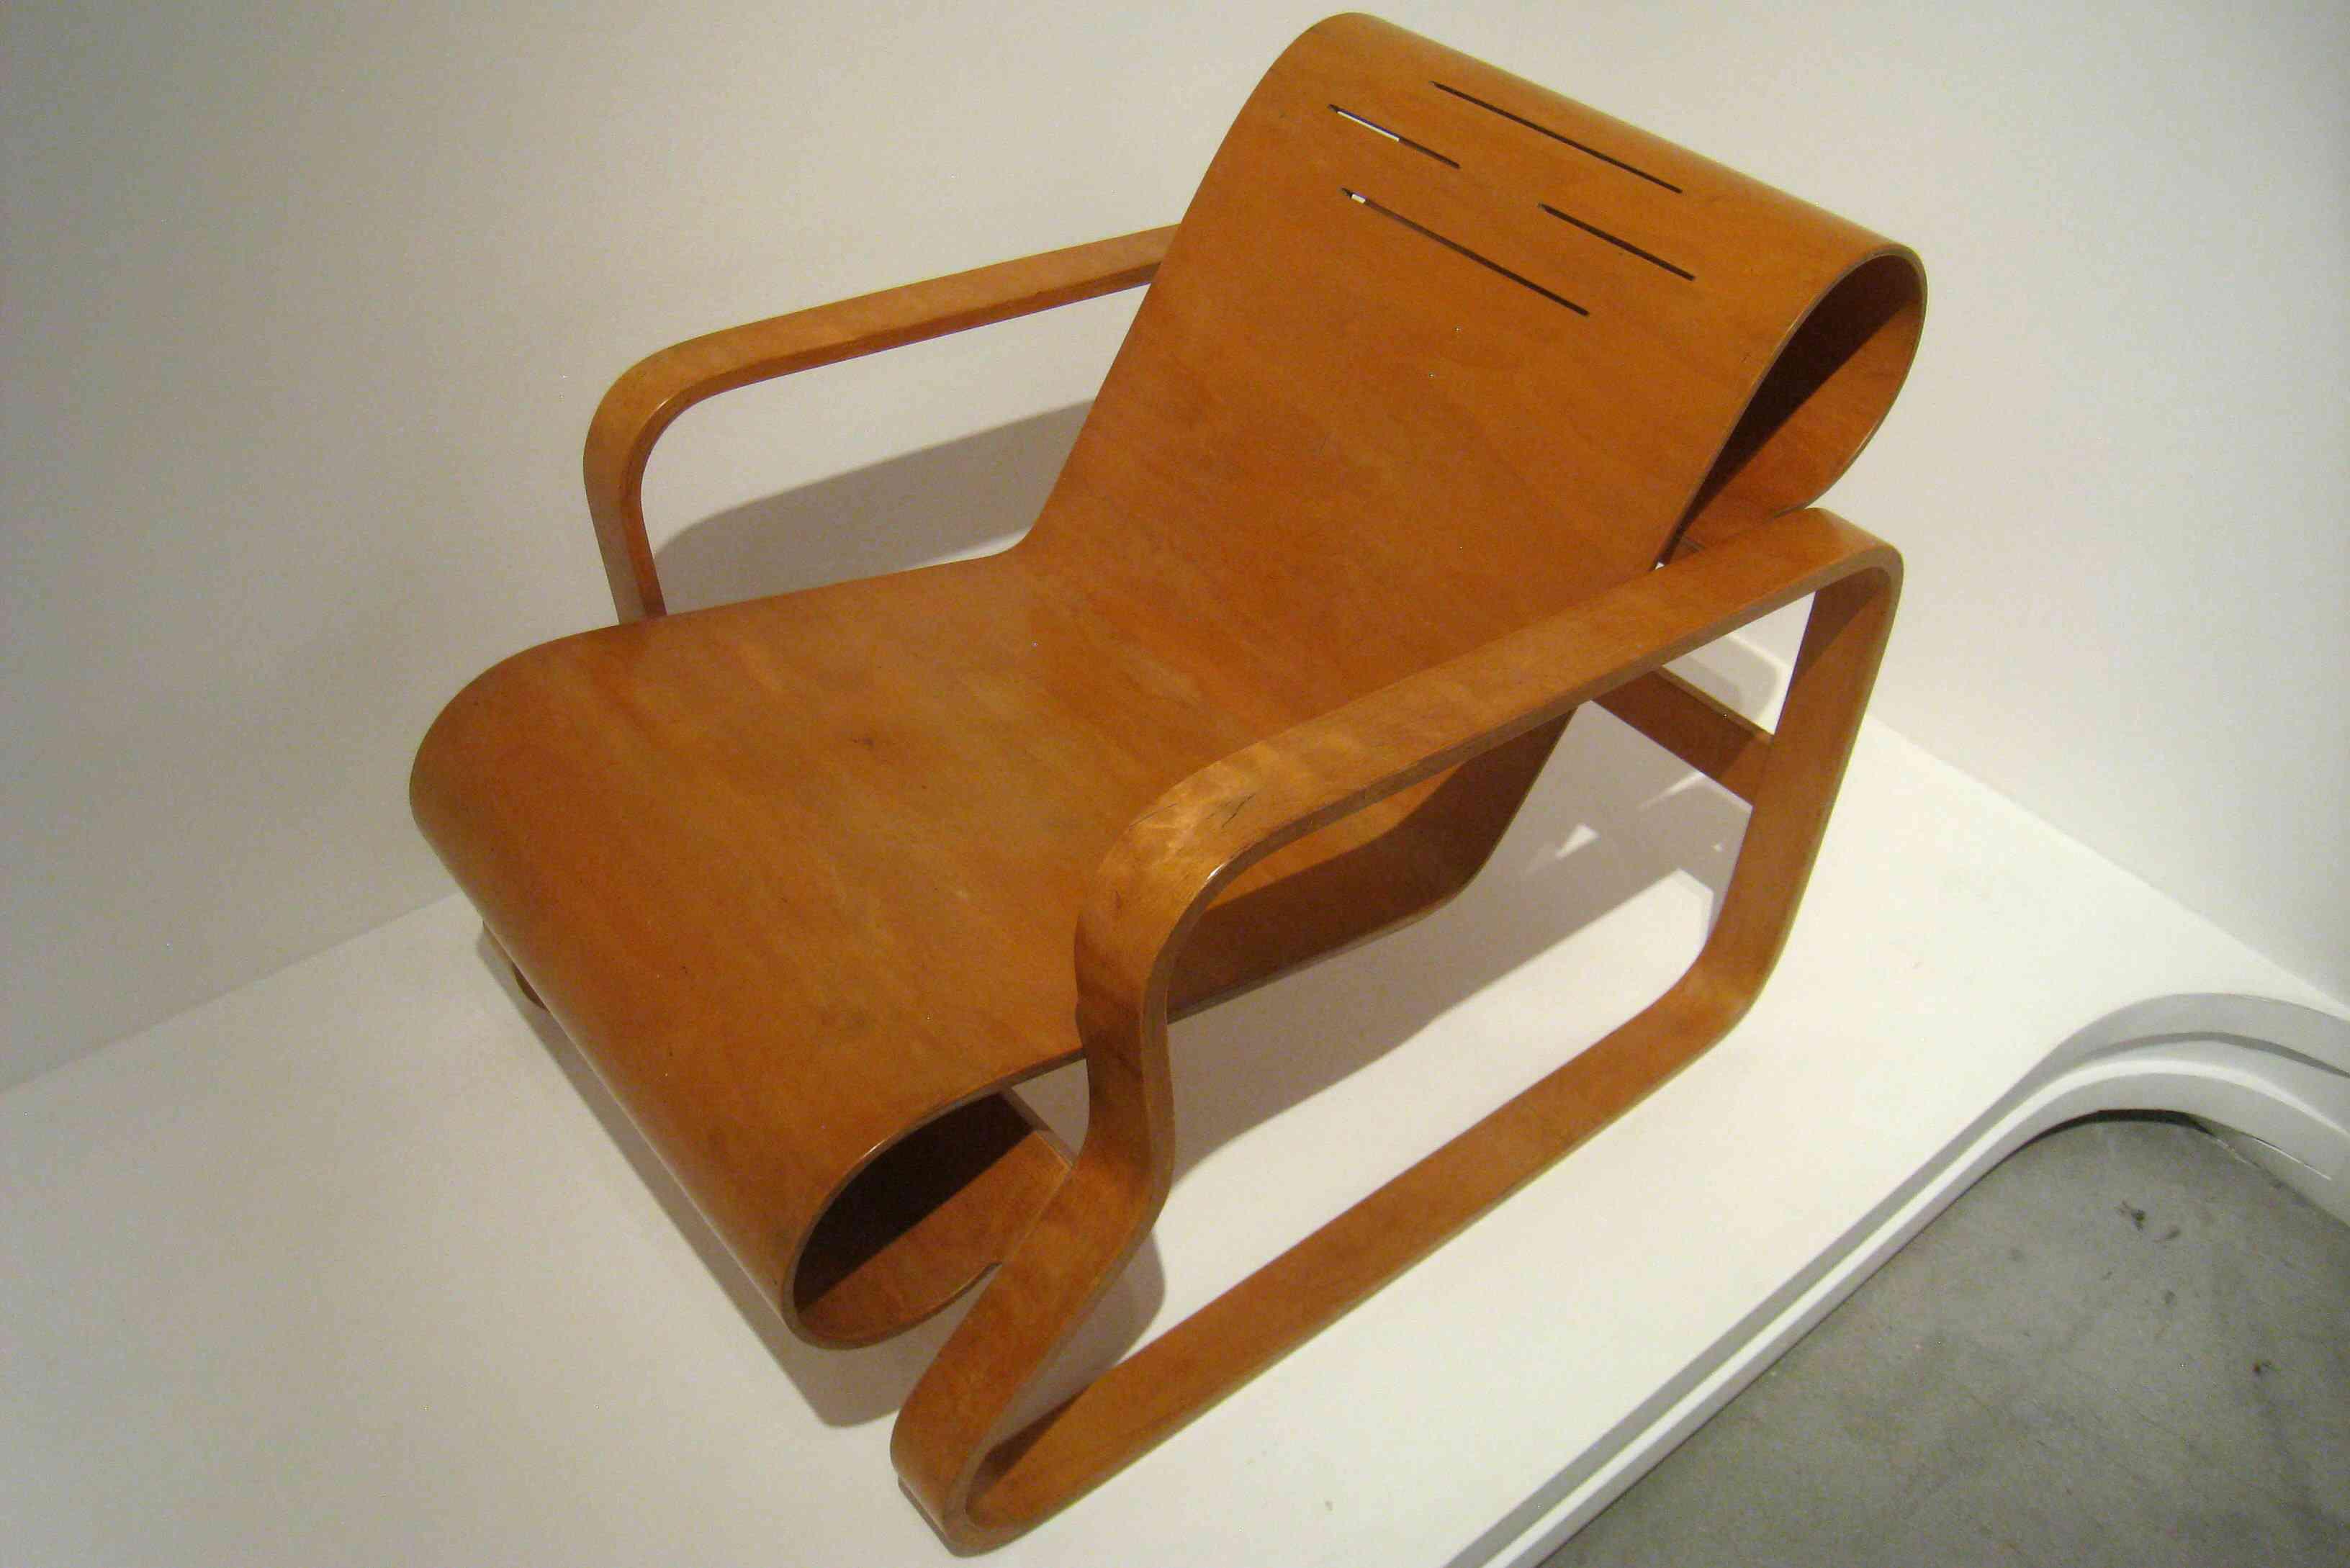 Bent wood chair designed by Alvar Aalto